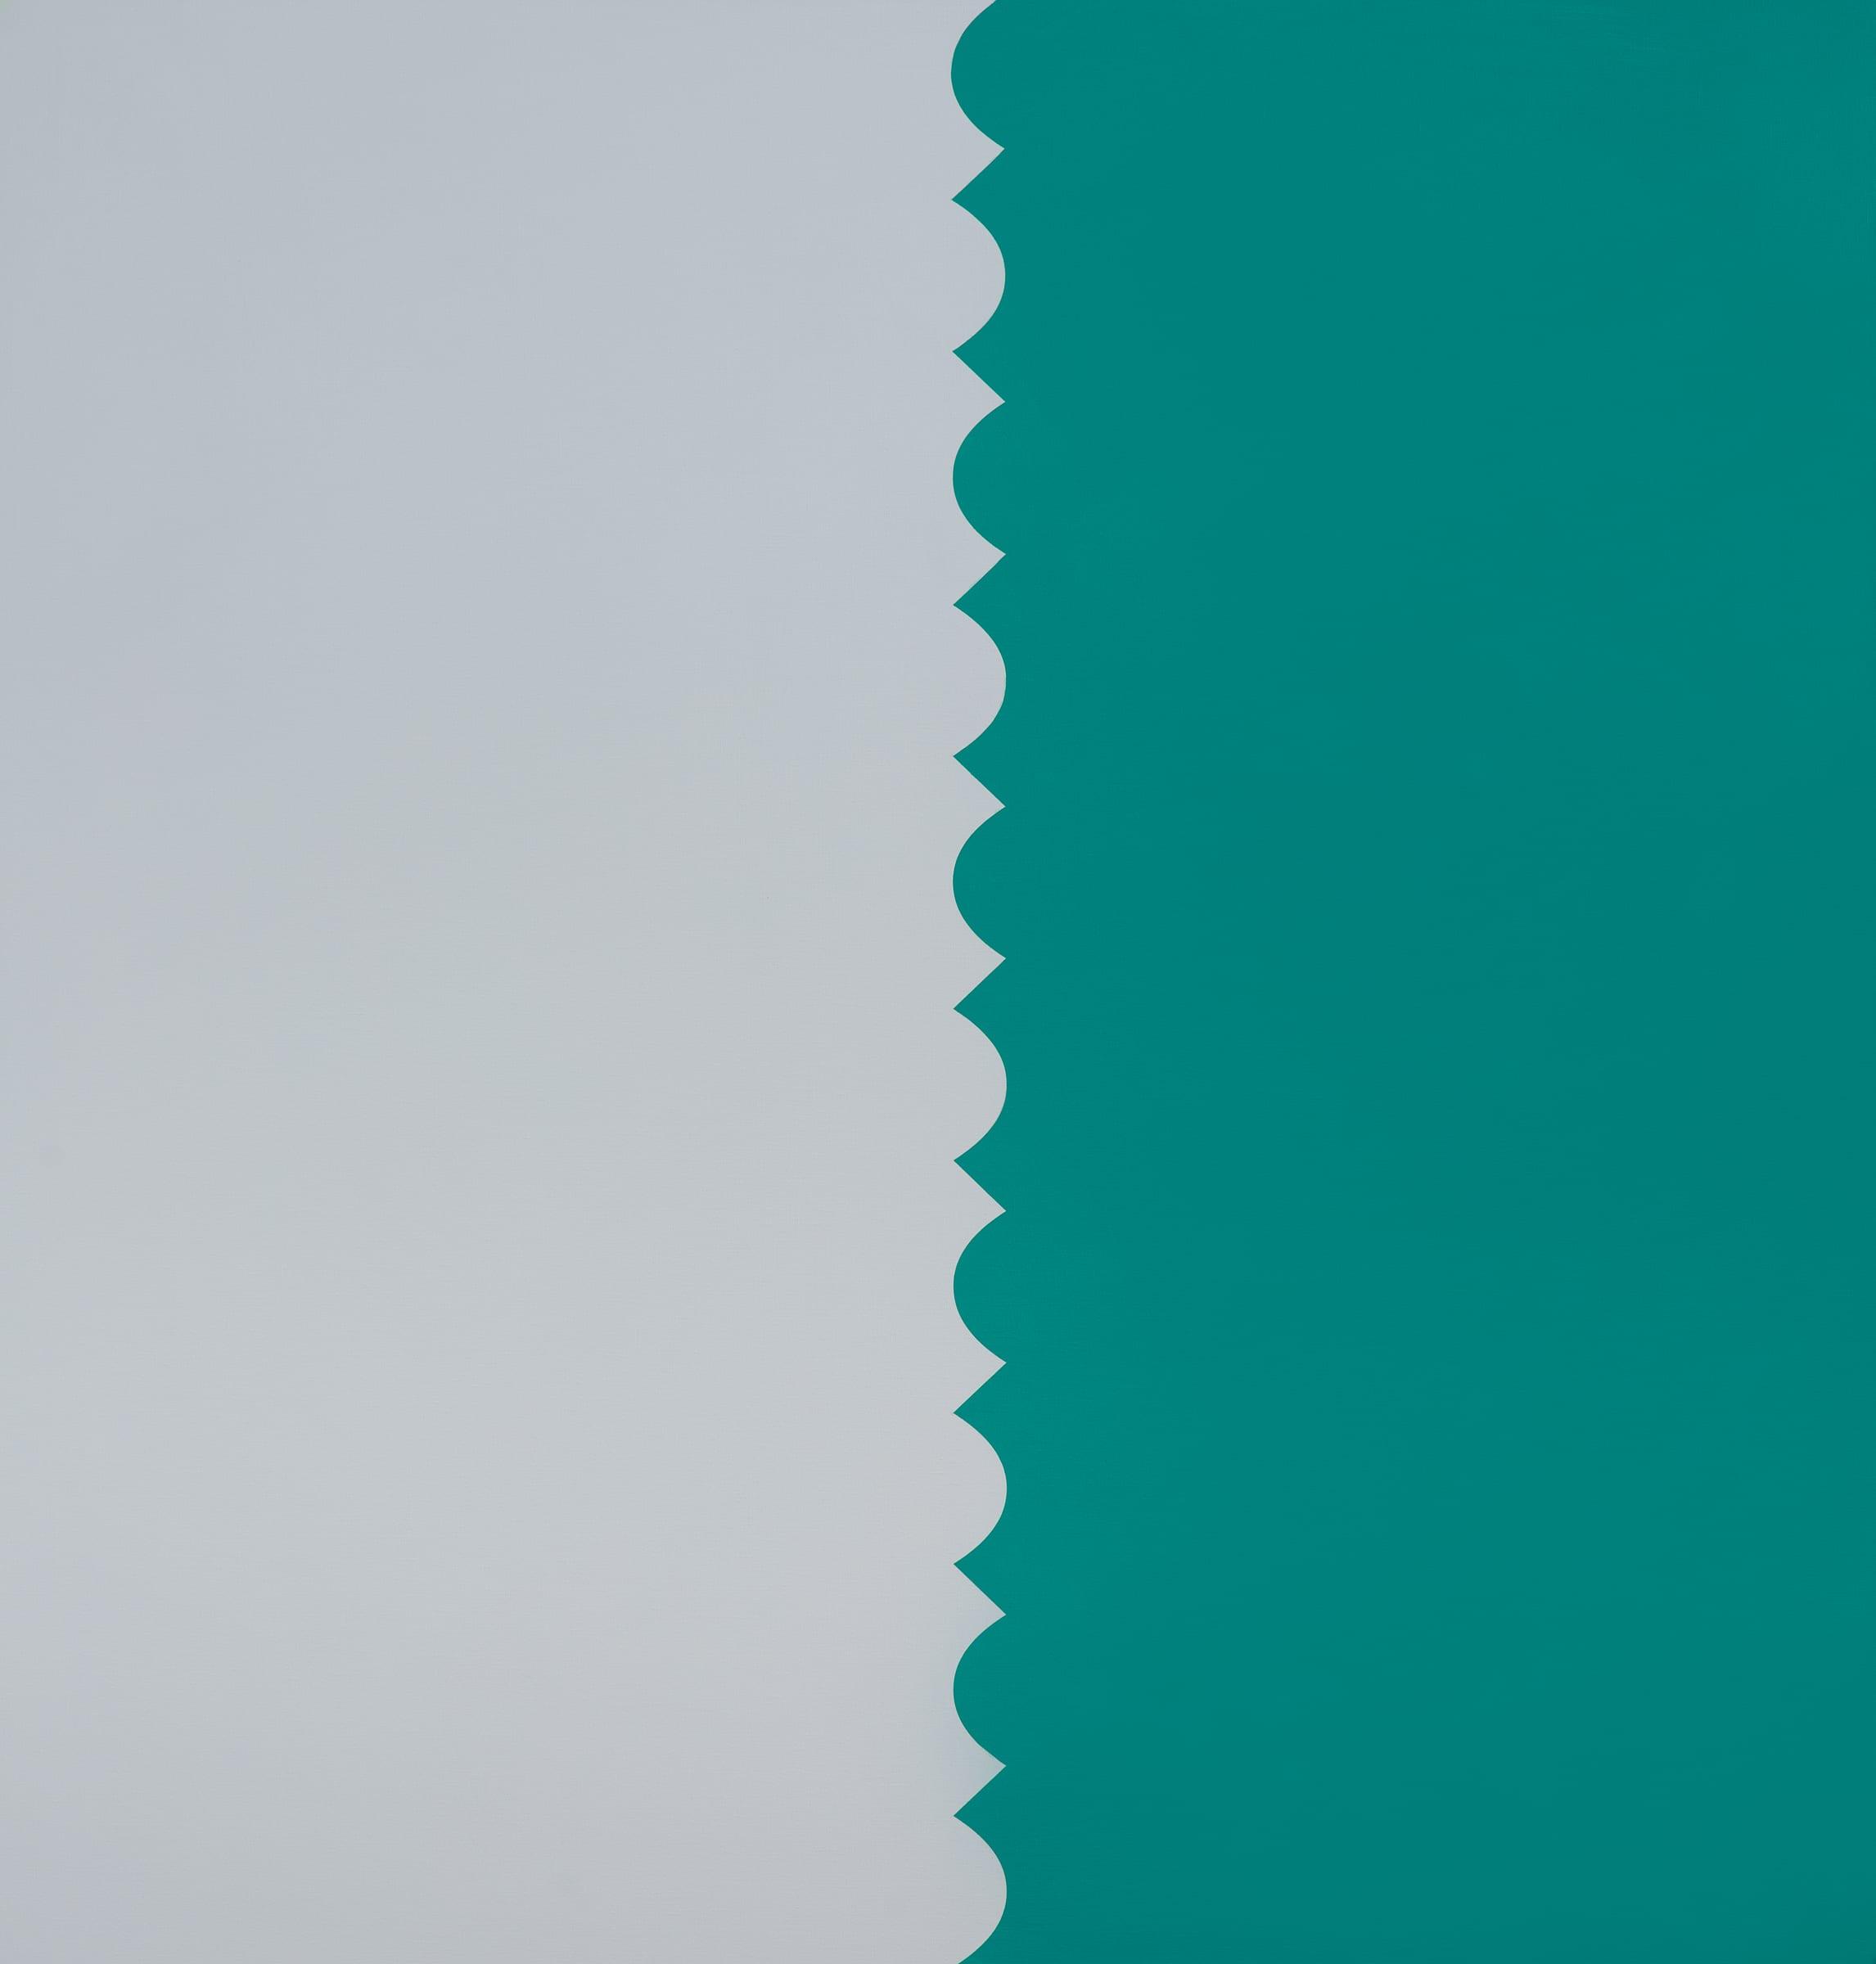 "<span class=""link fancybox-details-link""><a href=""/content/feature/11/artworks1532/"">View Detail Page</a></span><div class=""medium"">Acrylic on canvas</div> <div class=""dimensions"">151 x 142cm</div>"